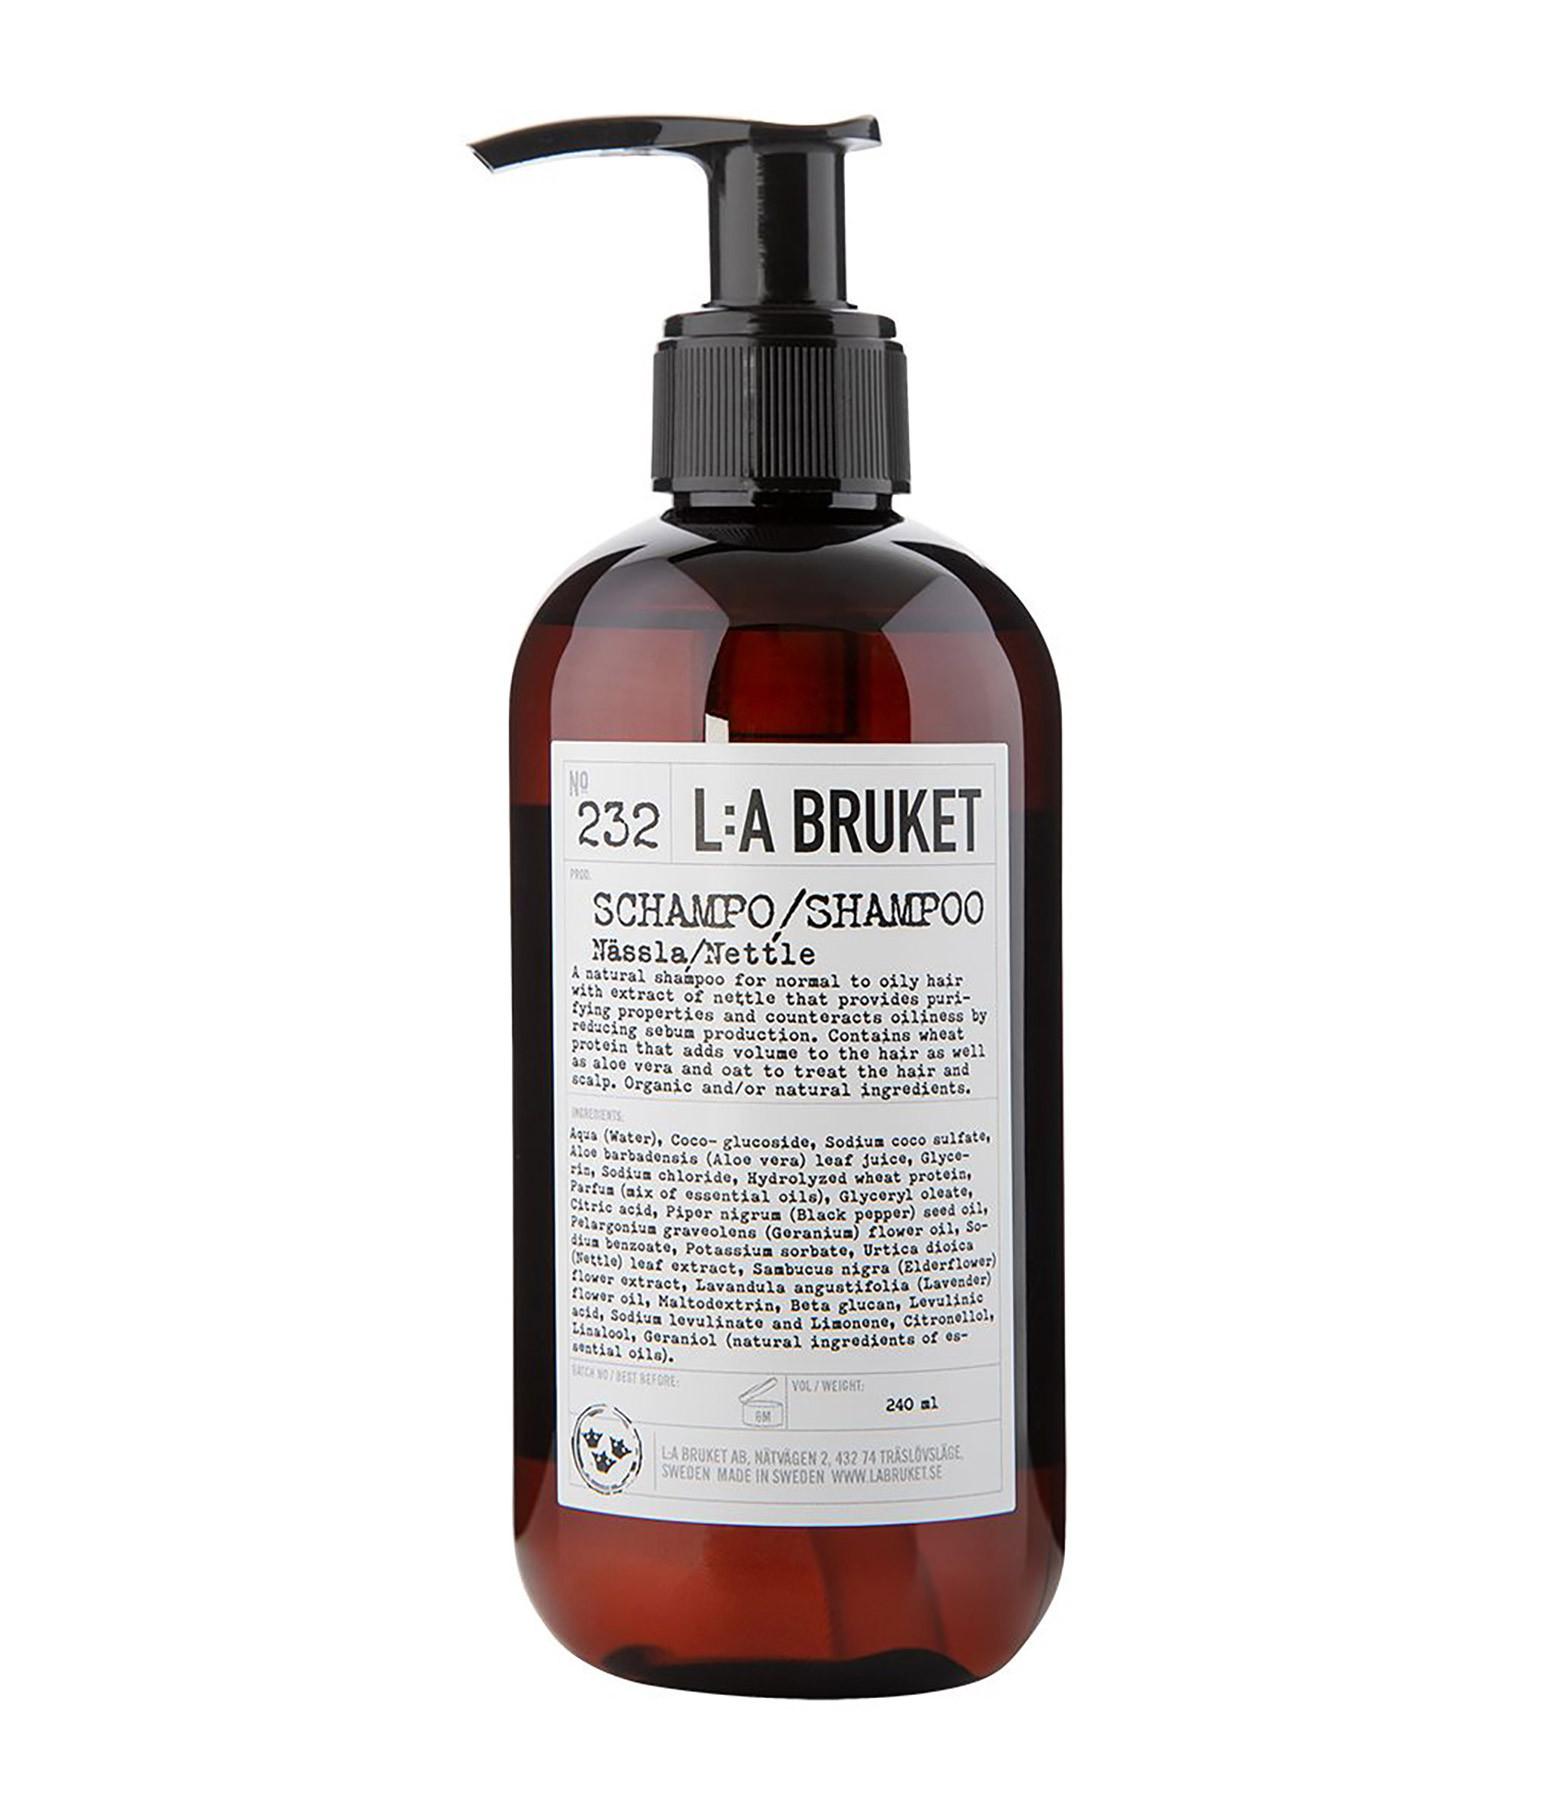 L:A BRUKET - Shampoing Orties 240 ml N°232